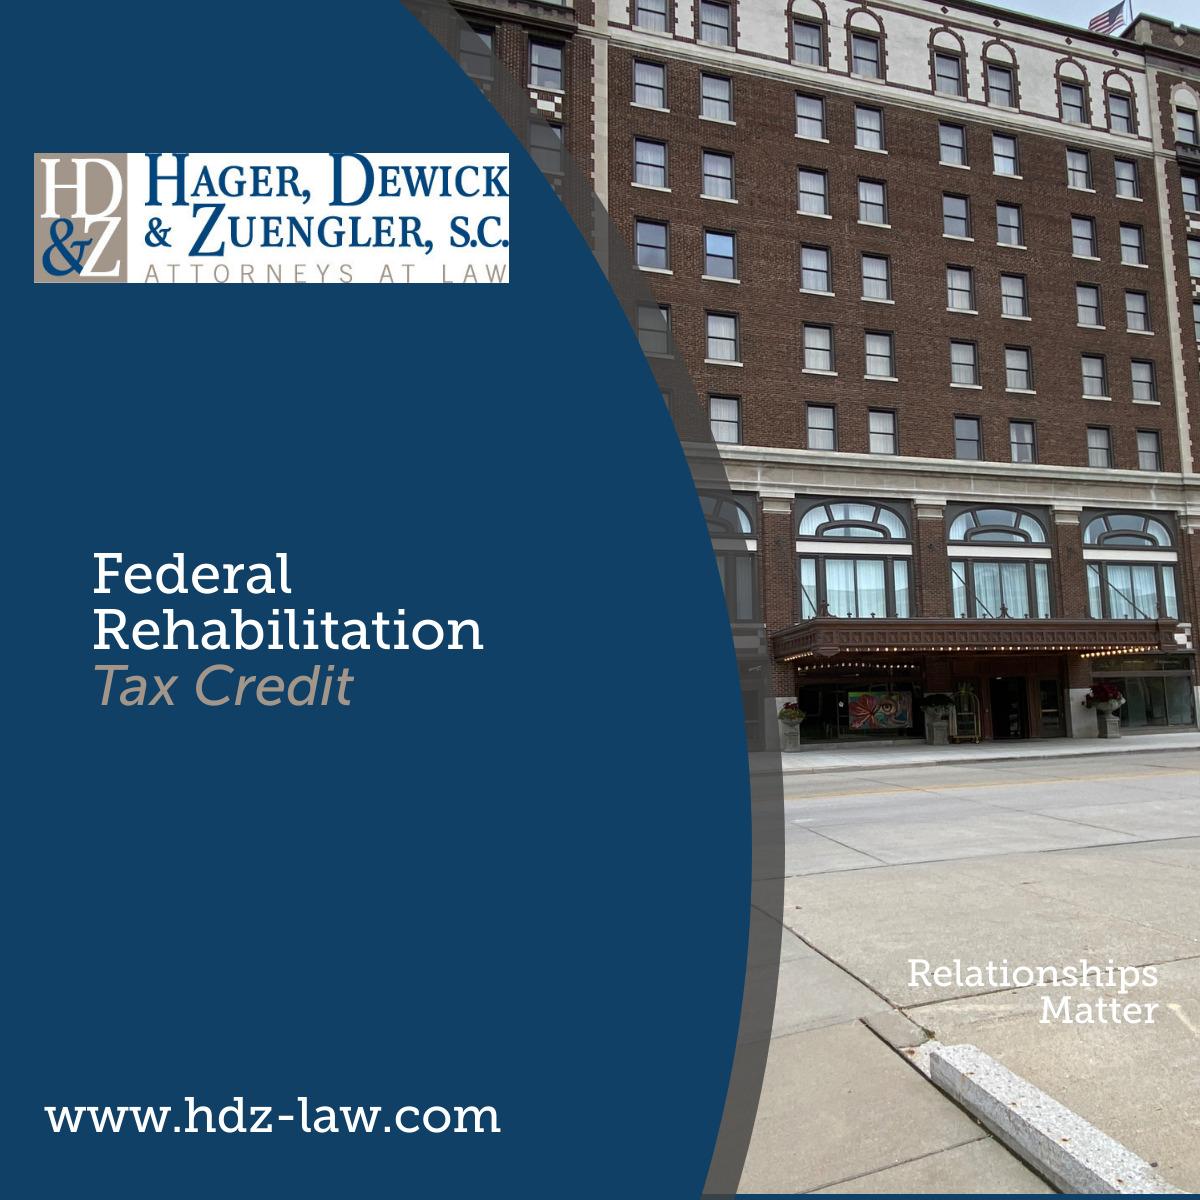 HDZ Federal Rehab Tax Credit